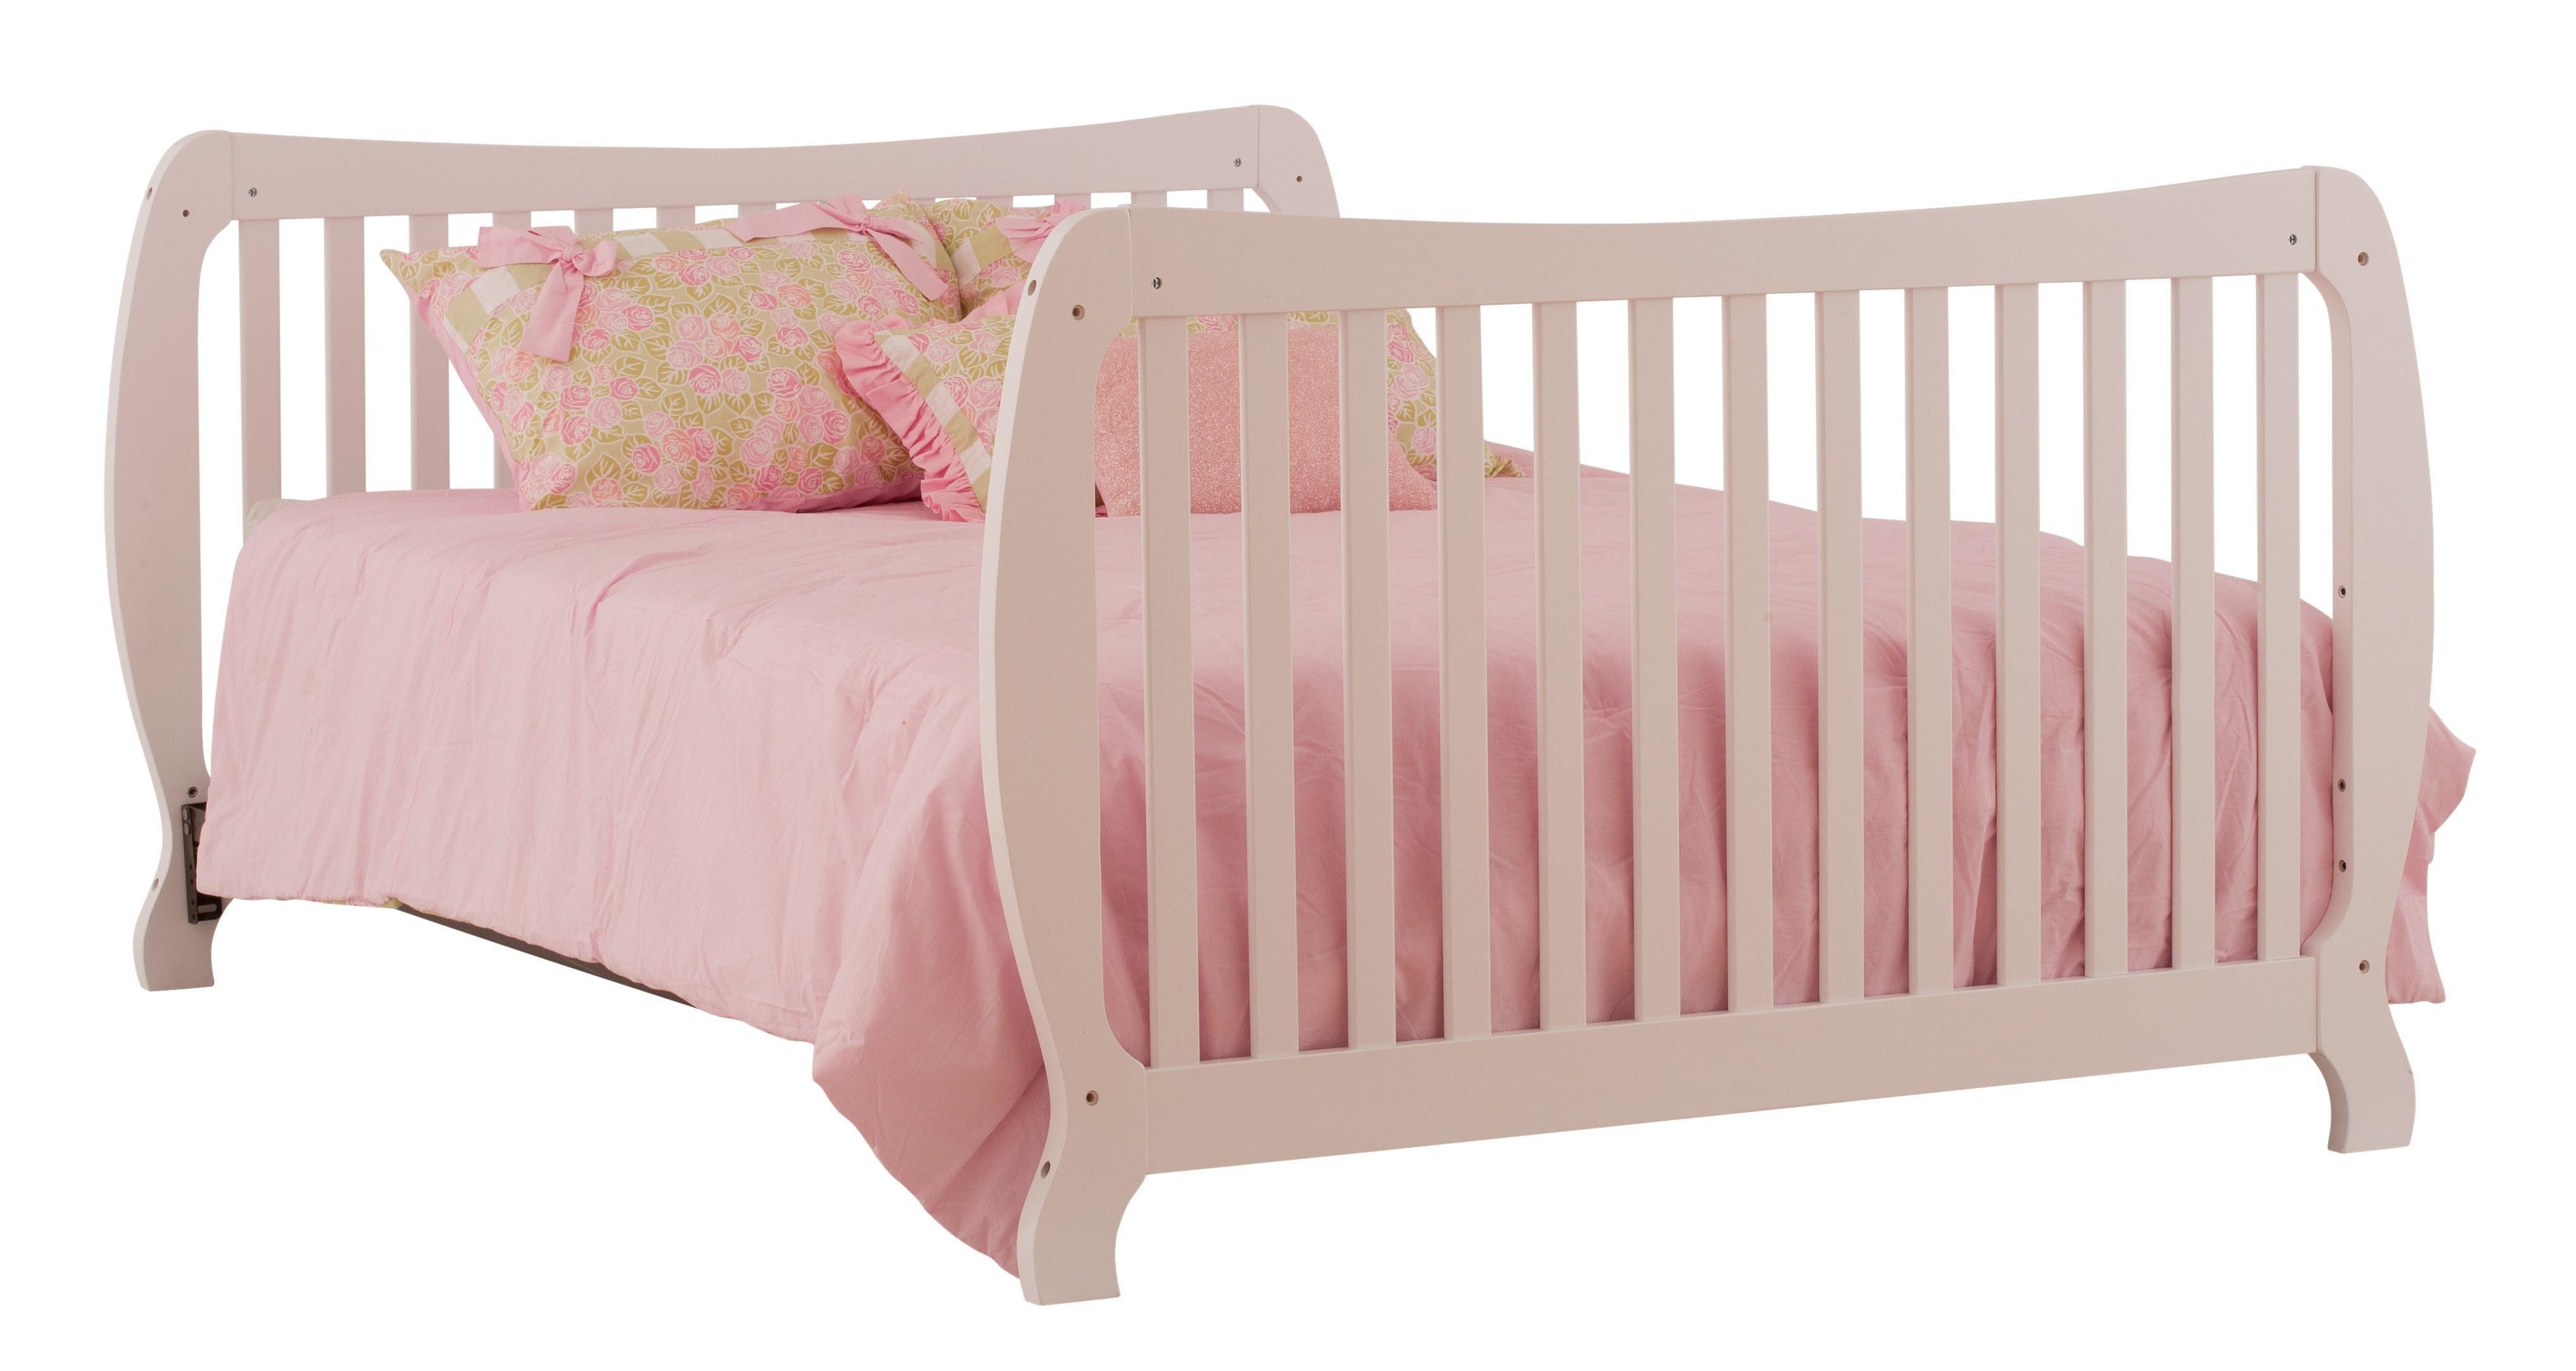 Stork craft crib reviews - Stork Craft Crib Reviews 28